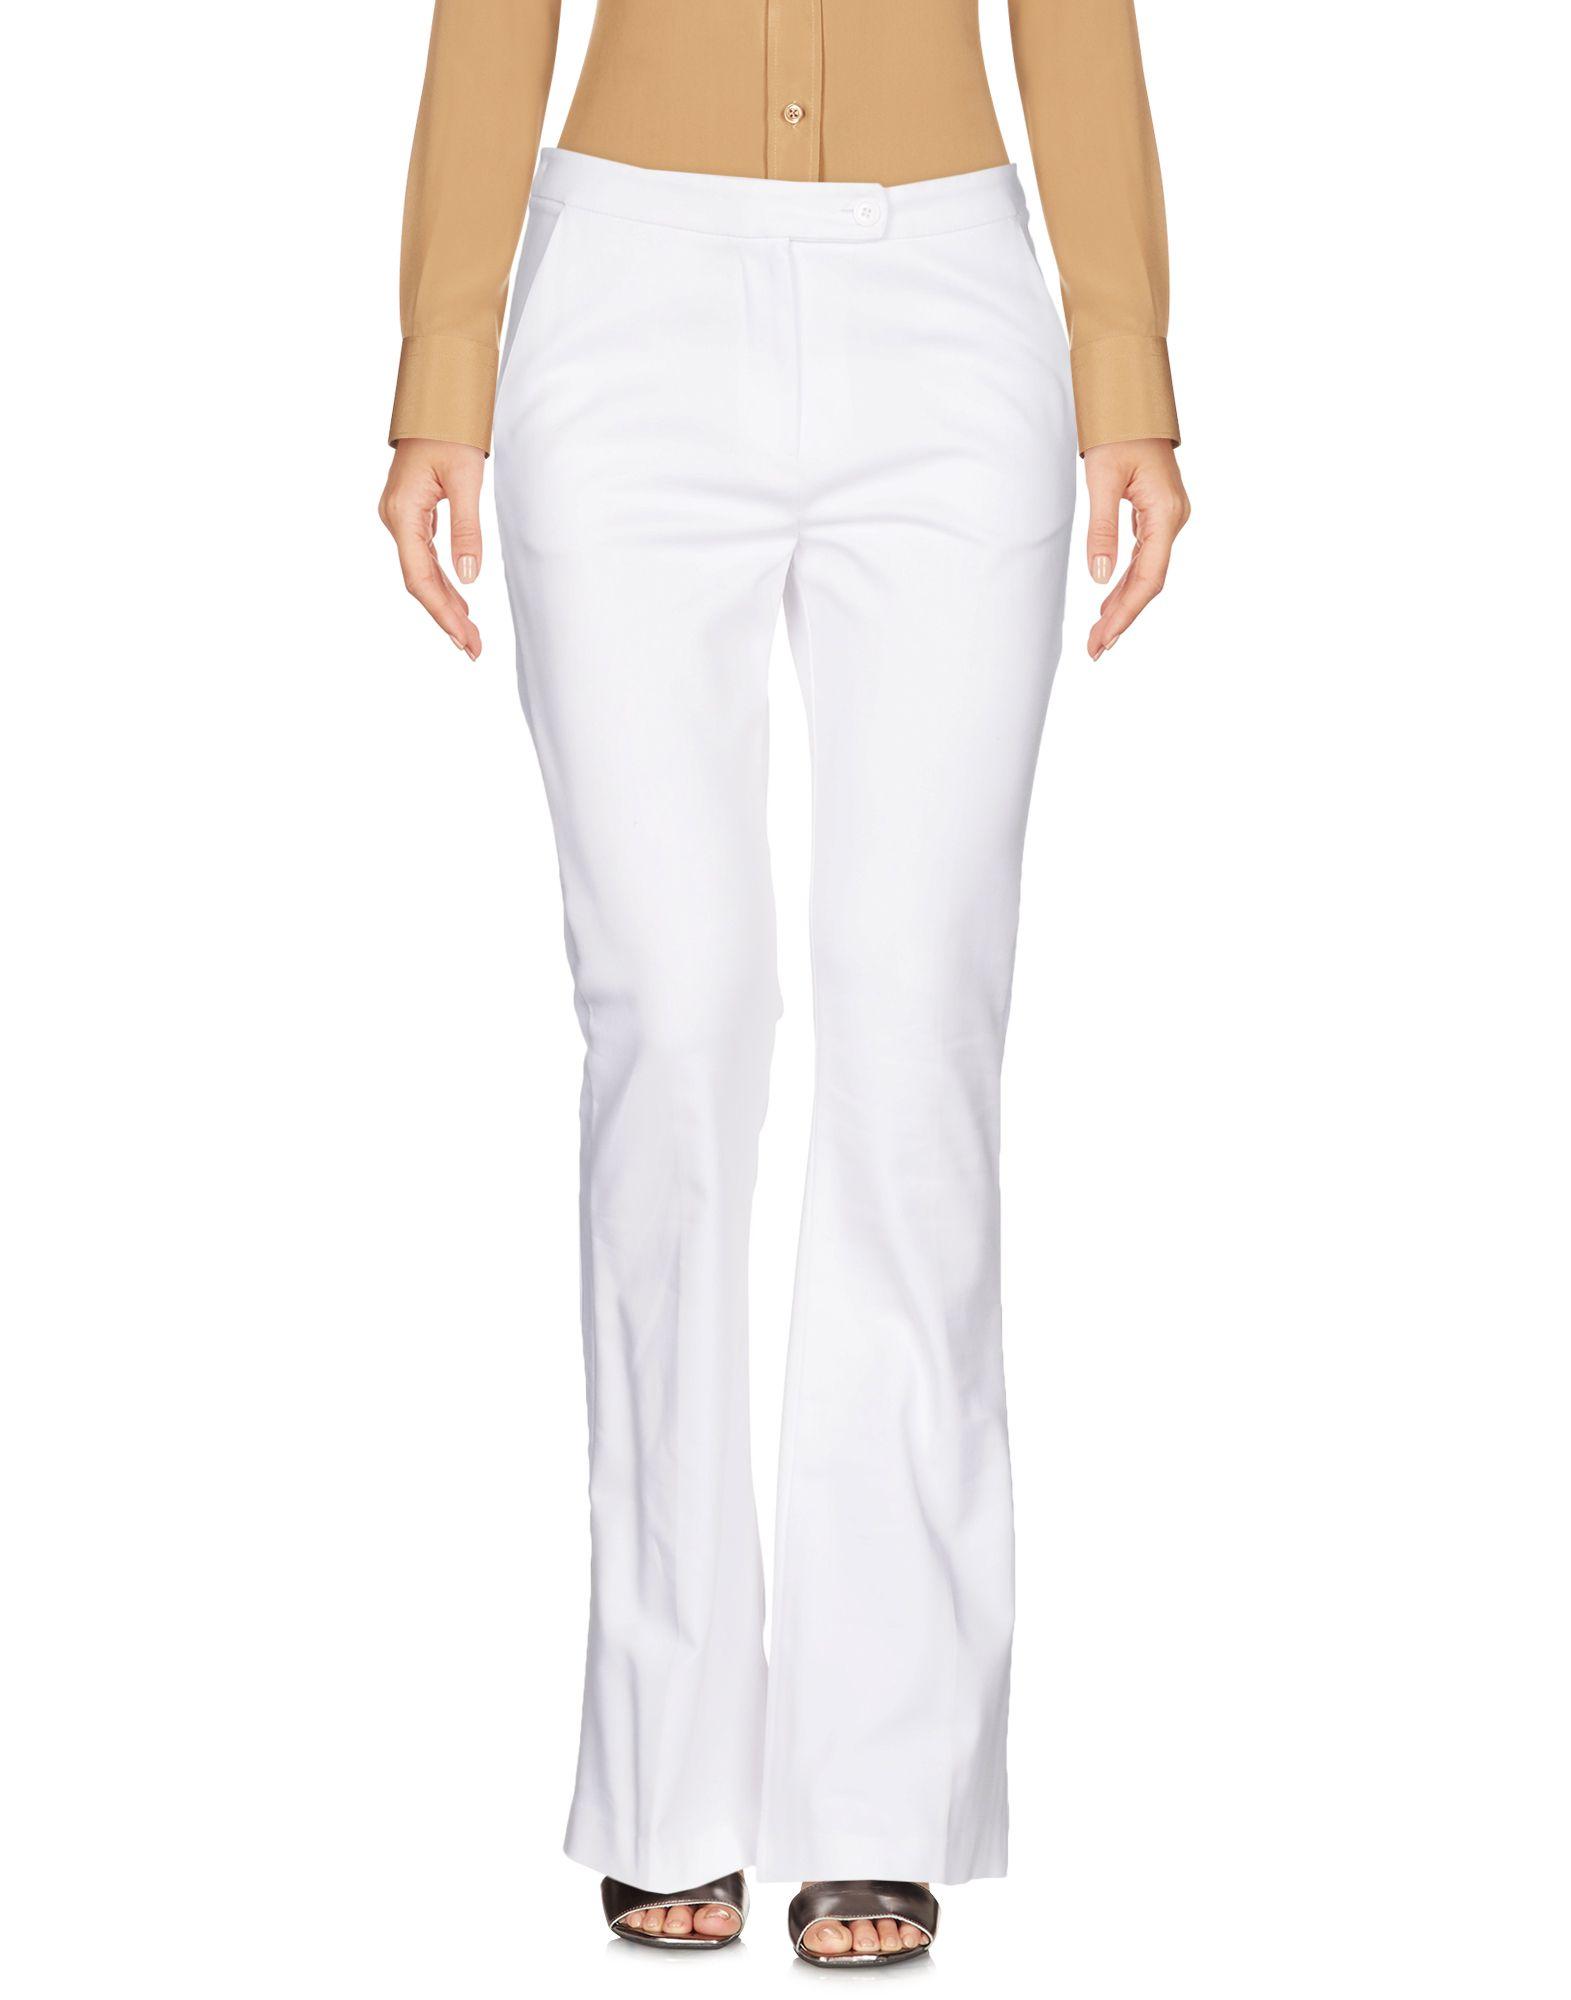 ICONE Повседневные брюки цены онлайн